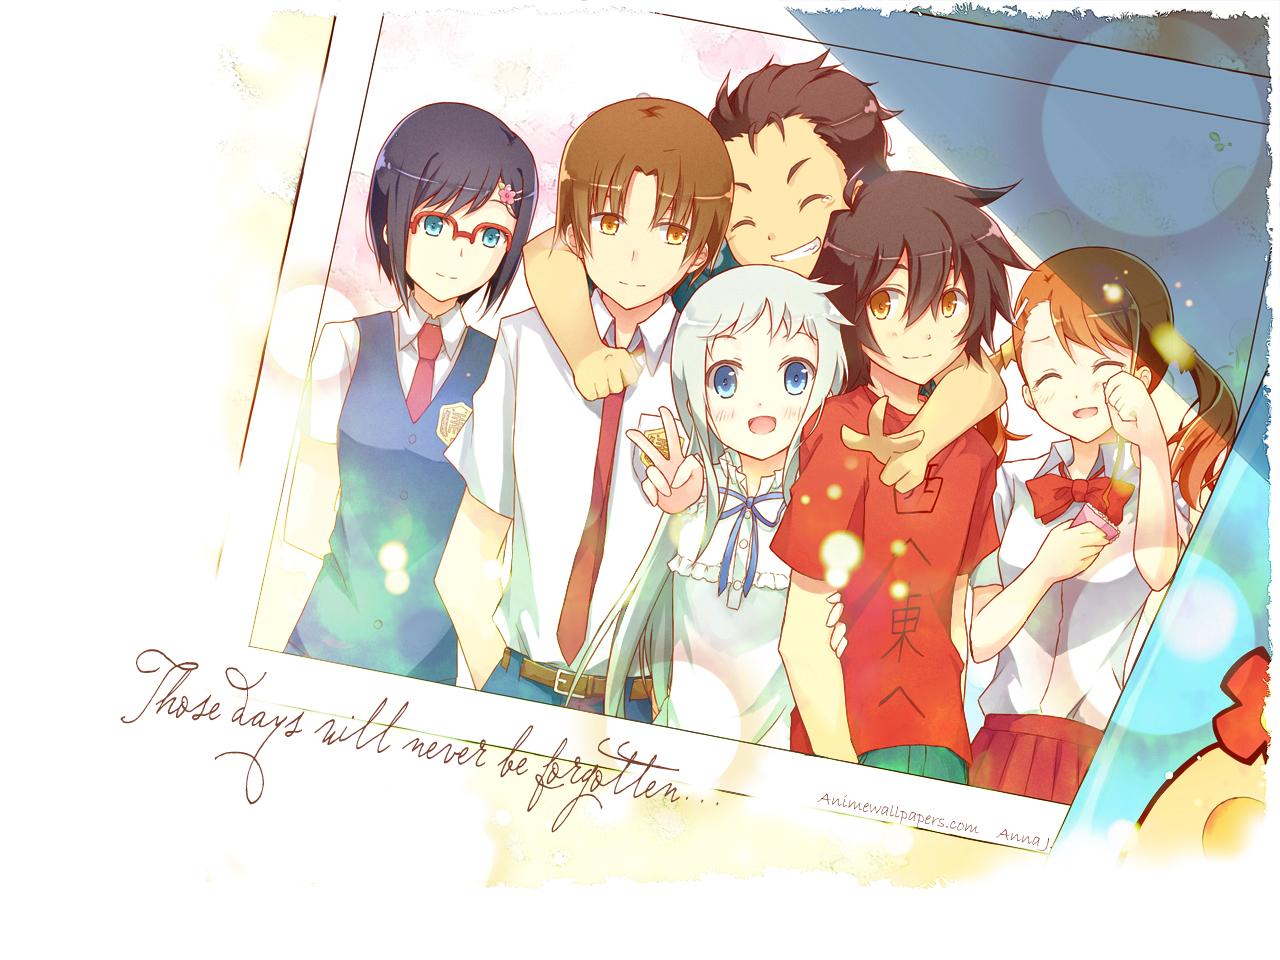 Ano Hana Anime Wallpaper # 1